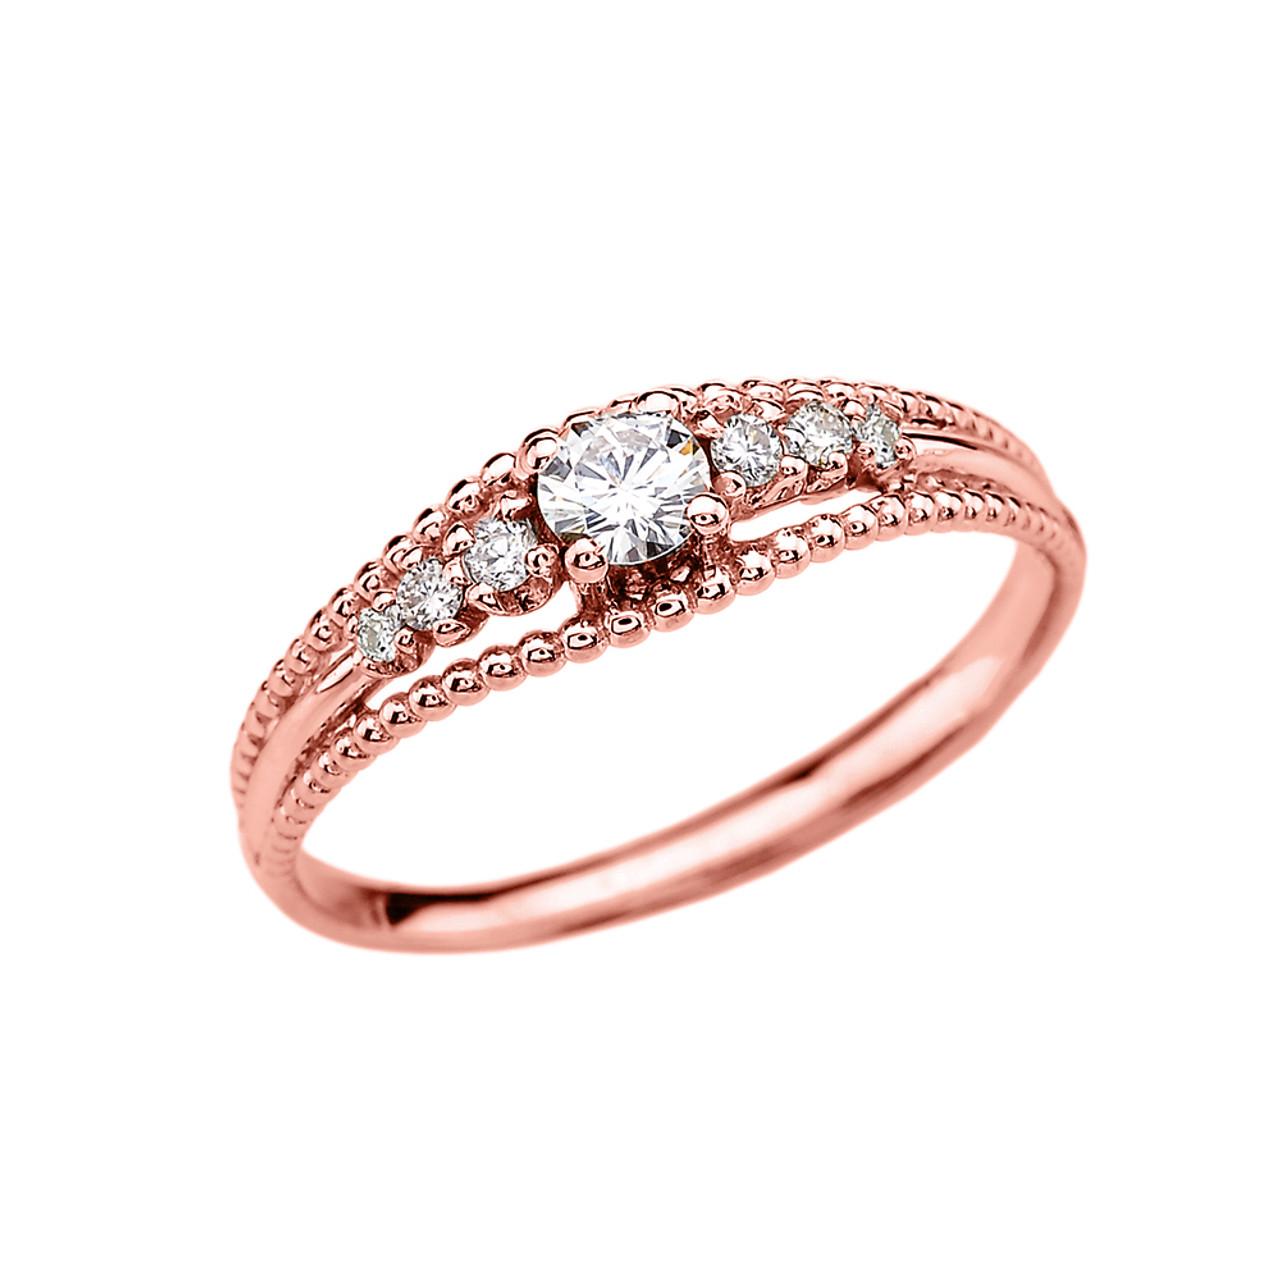 AQUAMARINE RING WITH DIAMONDS 14K ROSE GOLD 0.25CTS